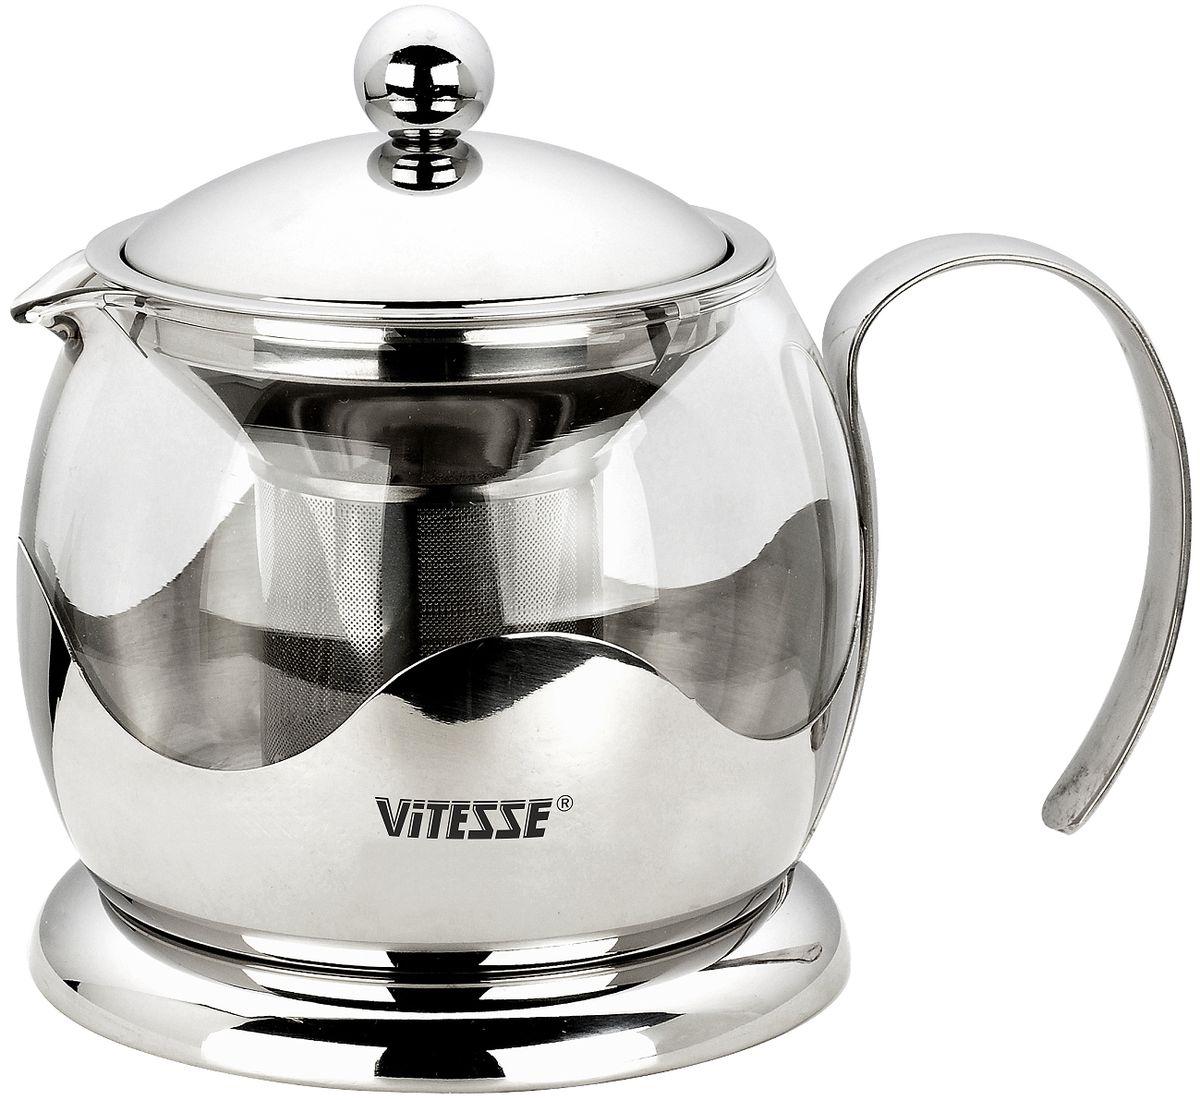 Чайник заварочный Vitesse Aniya, с фильтром, 800 мл чайник заварочный vitesse aniya с фильтром 800 мл